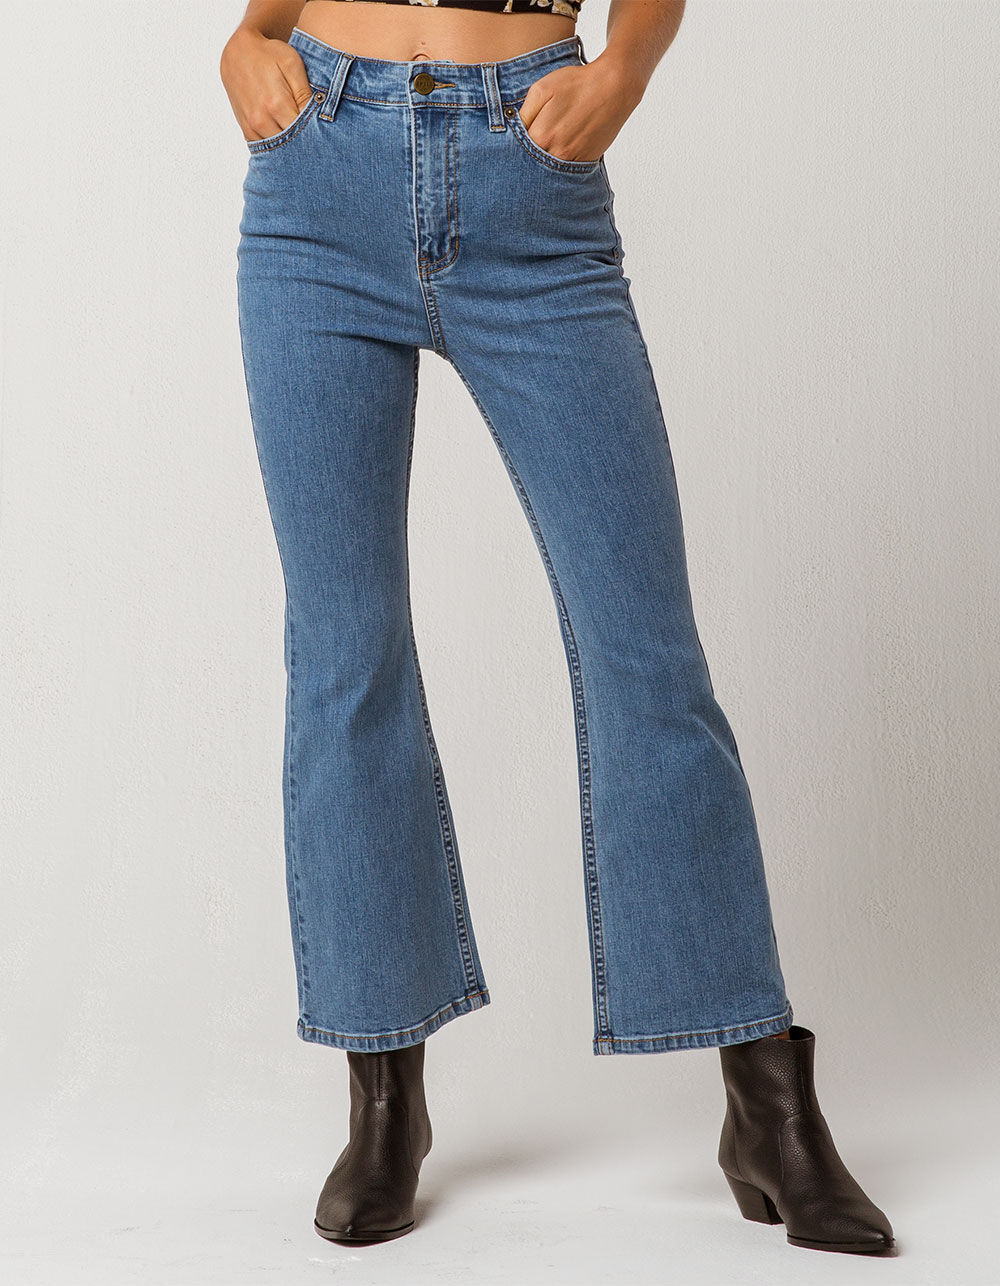 AMUSE SOCIETY Beach Boogie Flare Jeans